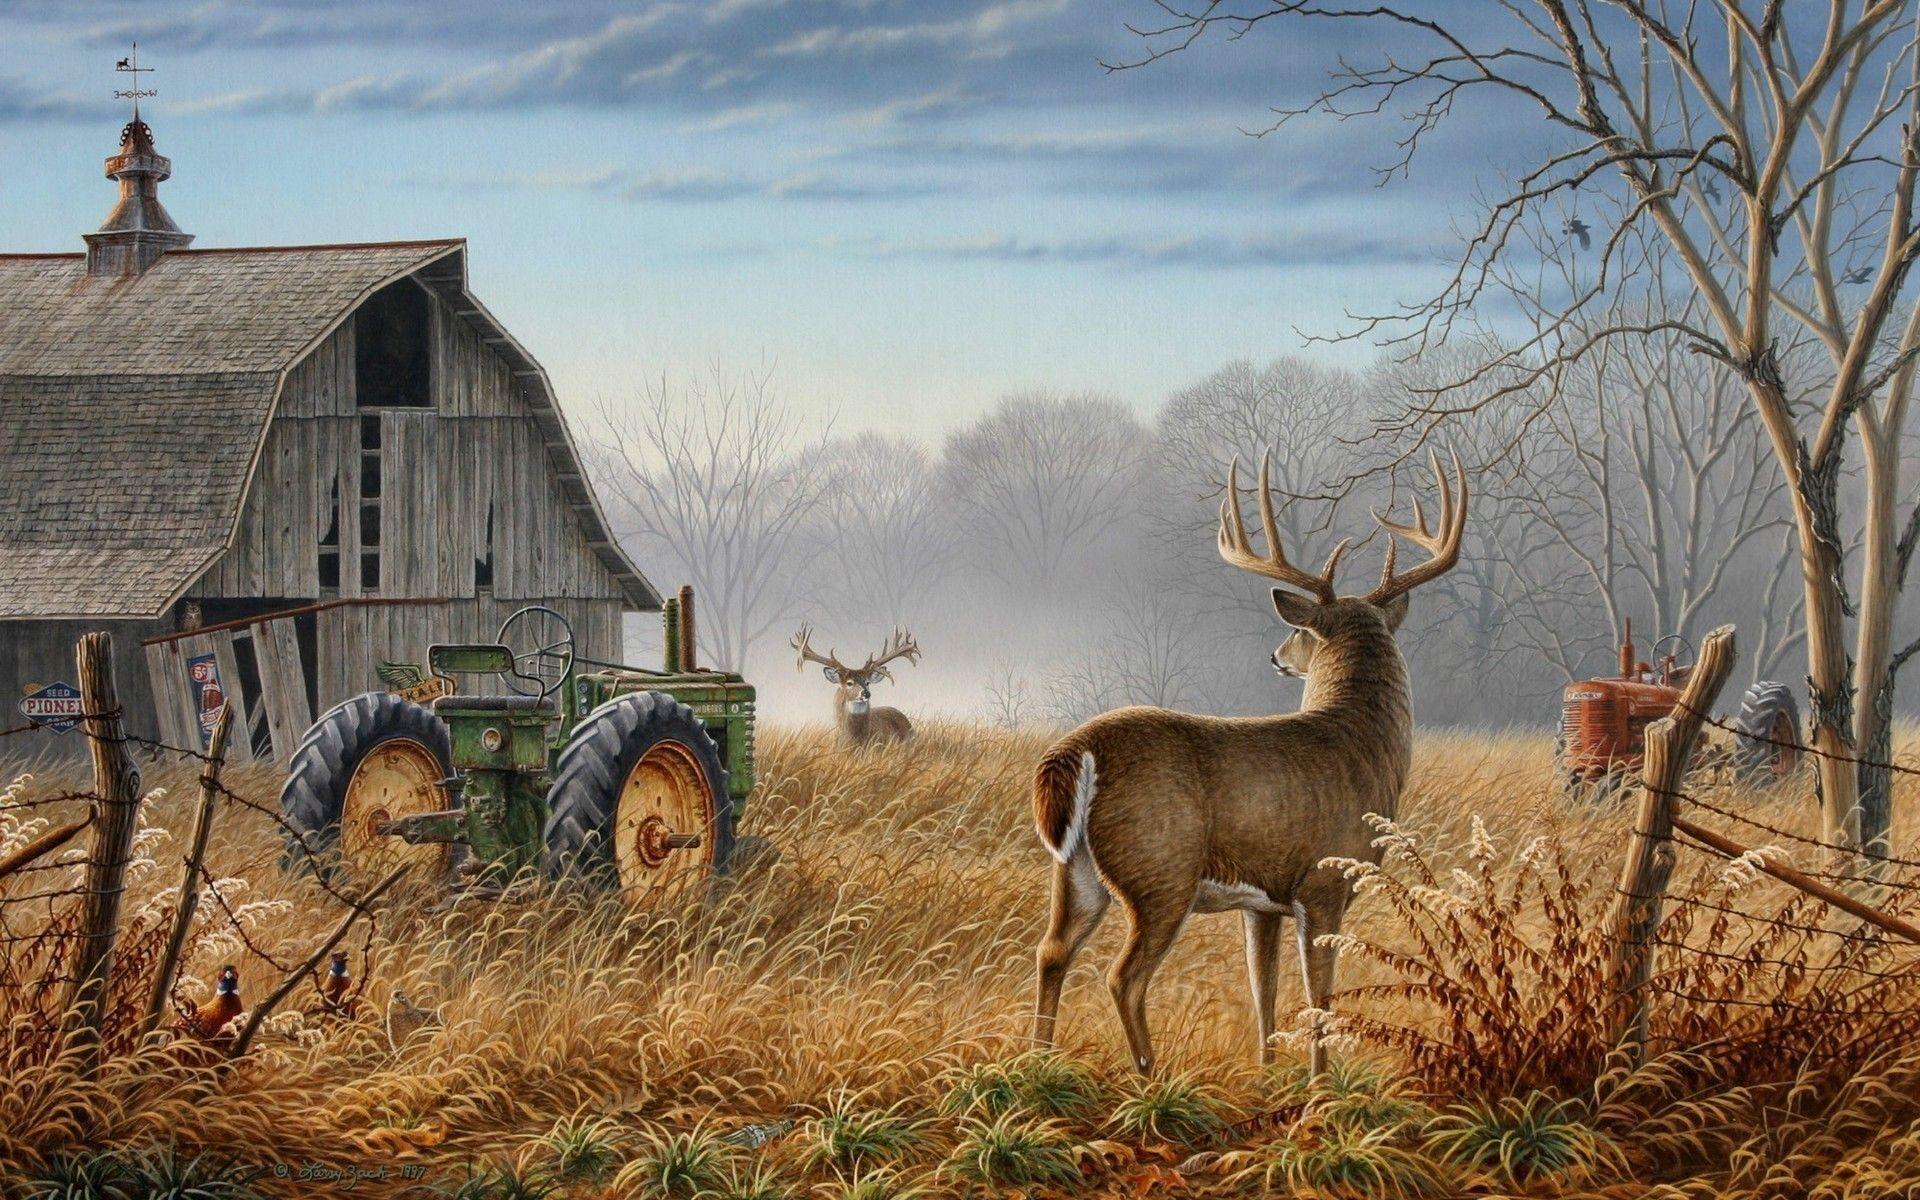 Deer Wallpaper For Android FbD · Wild Desktop HD